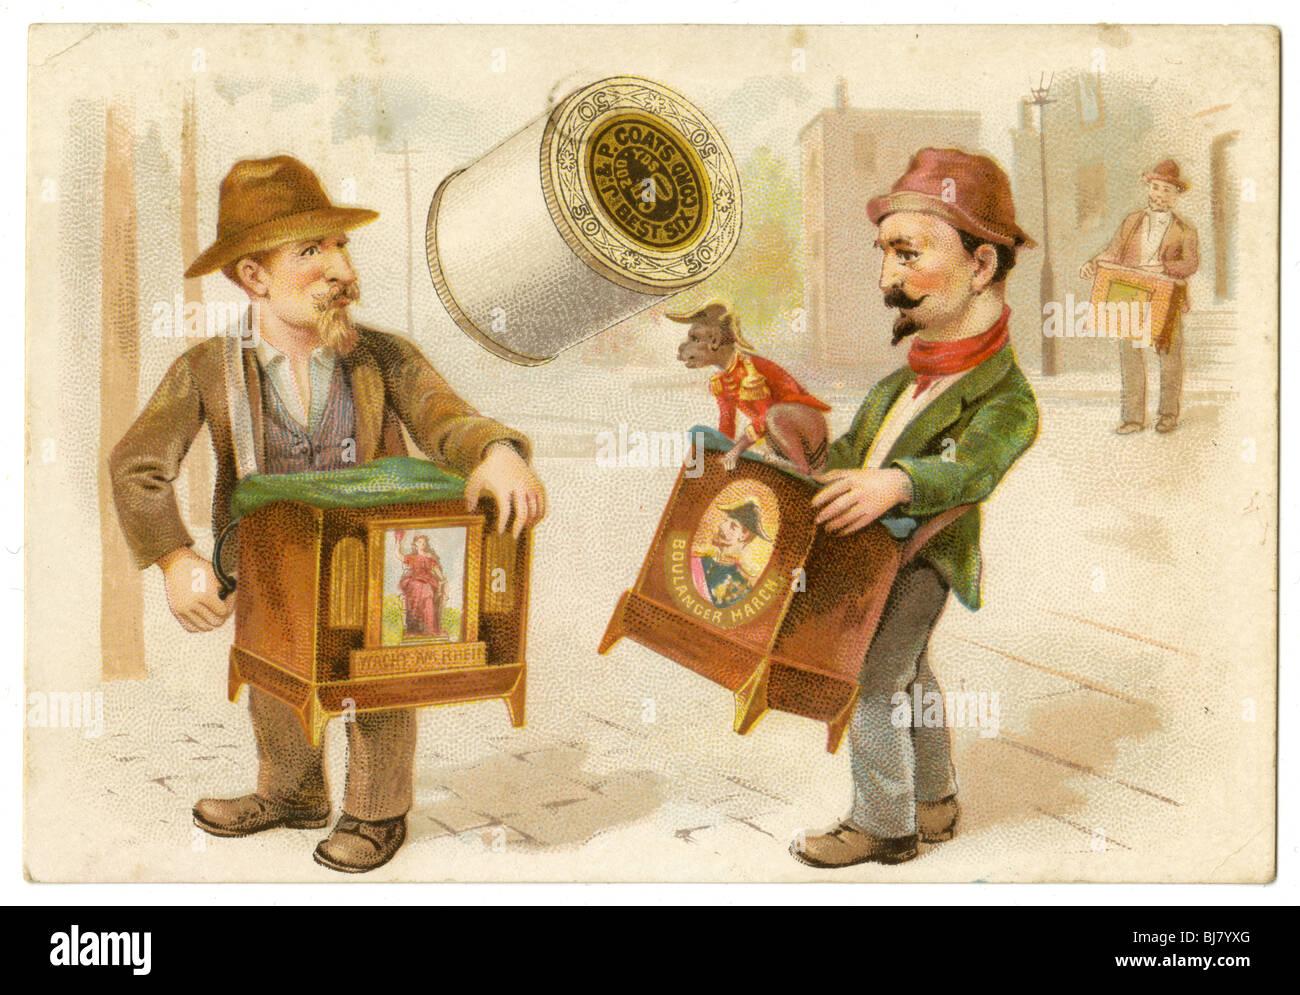 Vers 1890 Victorian trade card pour J&P Coats thread. Broyeurs d'organes avec le singe. Photo Stock